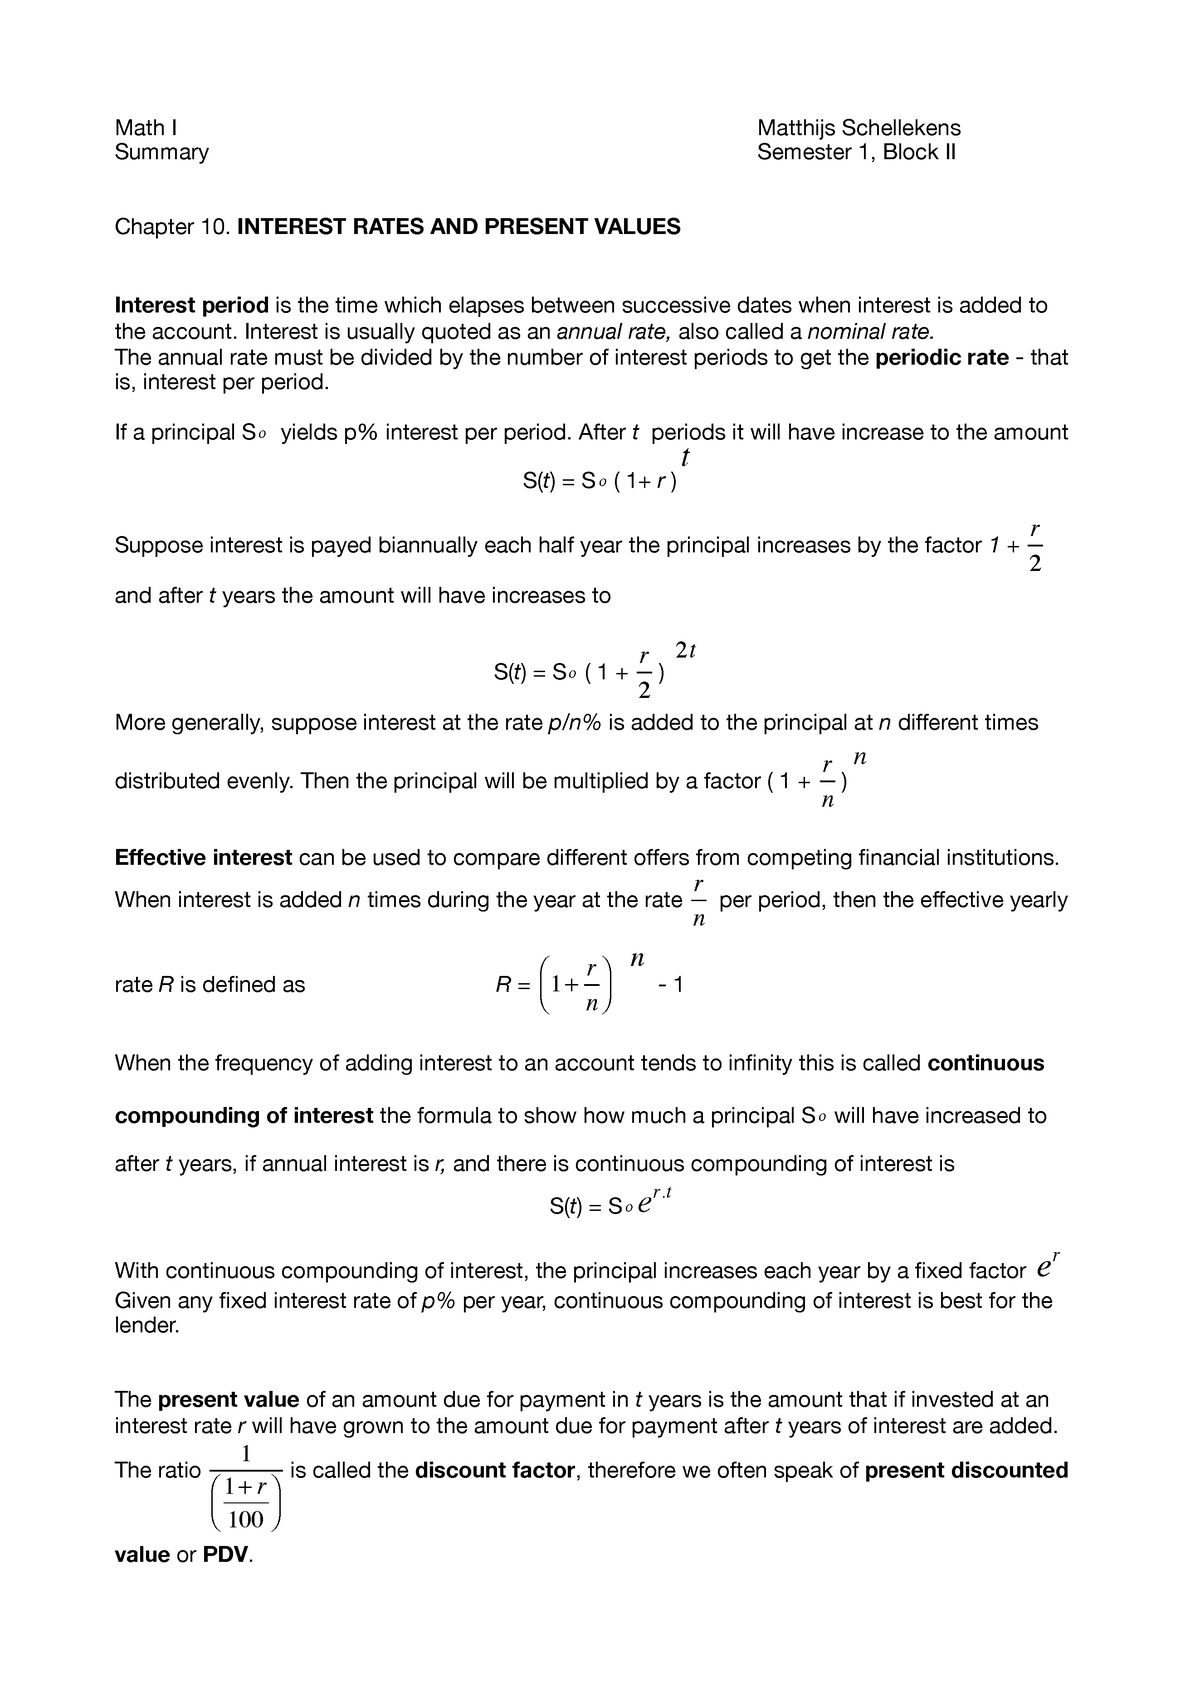 Mathematics 1 Summary Interest Rates And Present Values Studocu